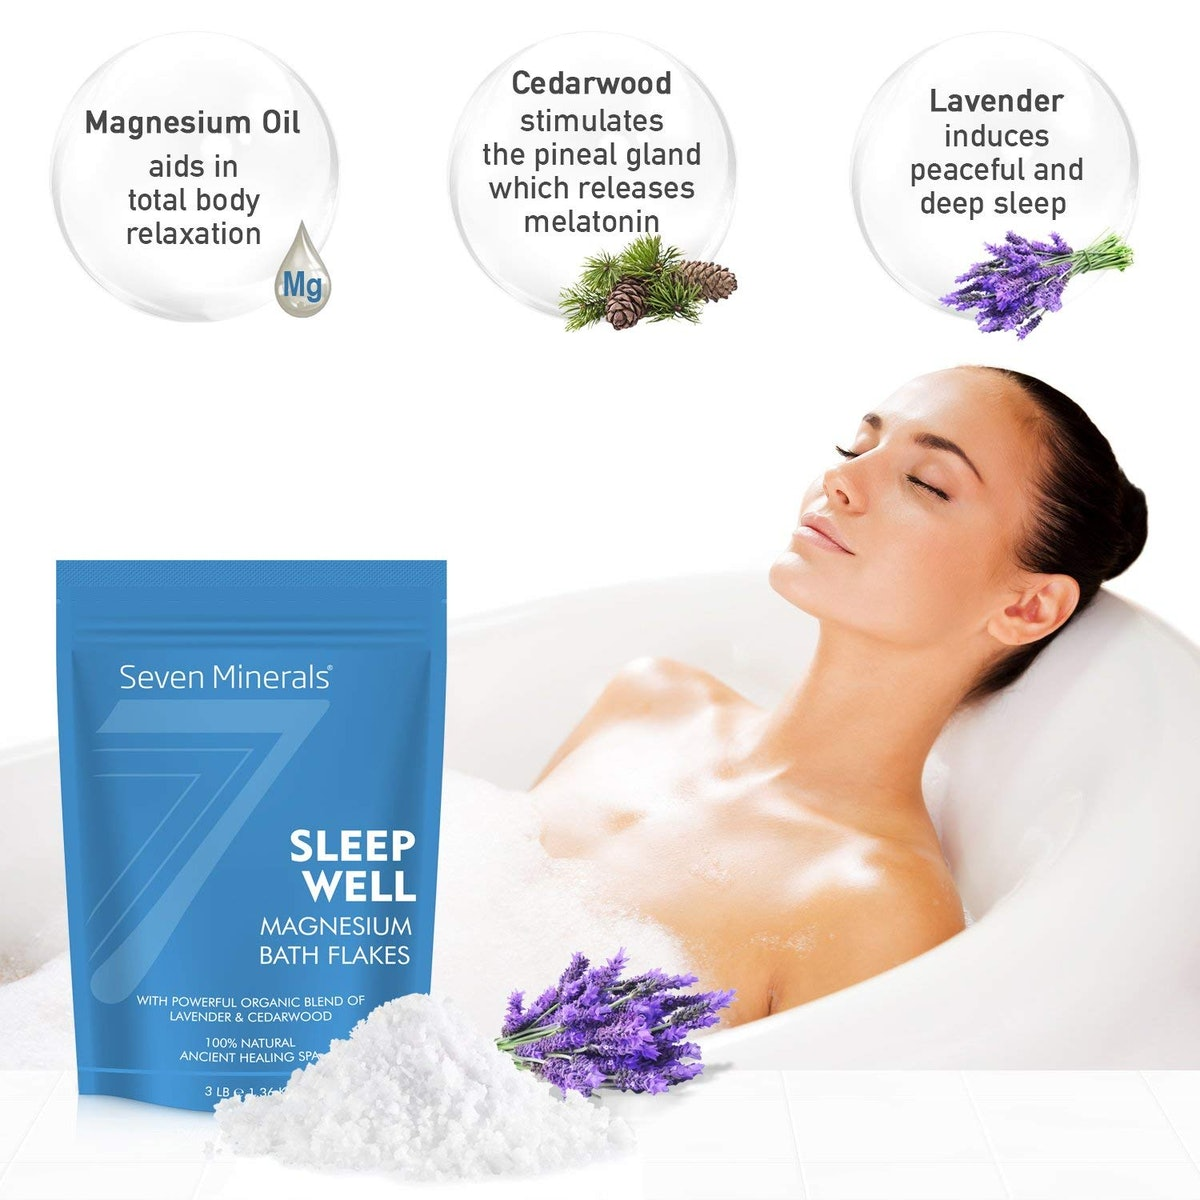 Seven Minerals SLEEP WELL Magnesium Chloride Bath Flakes